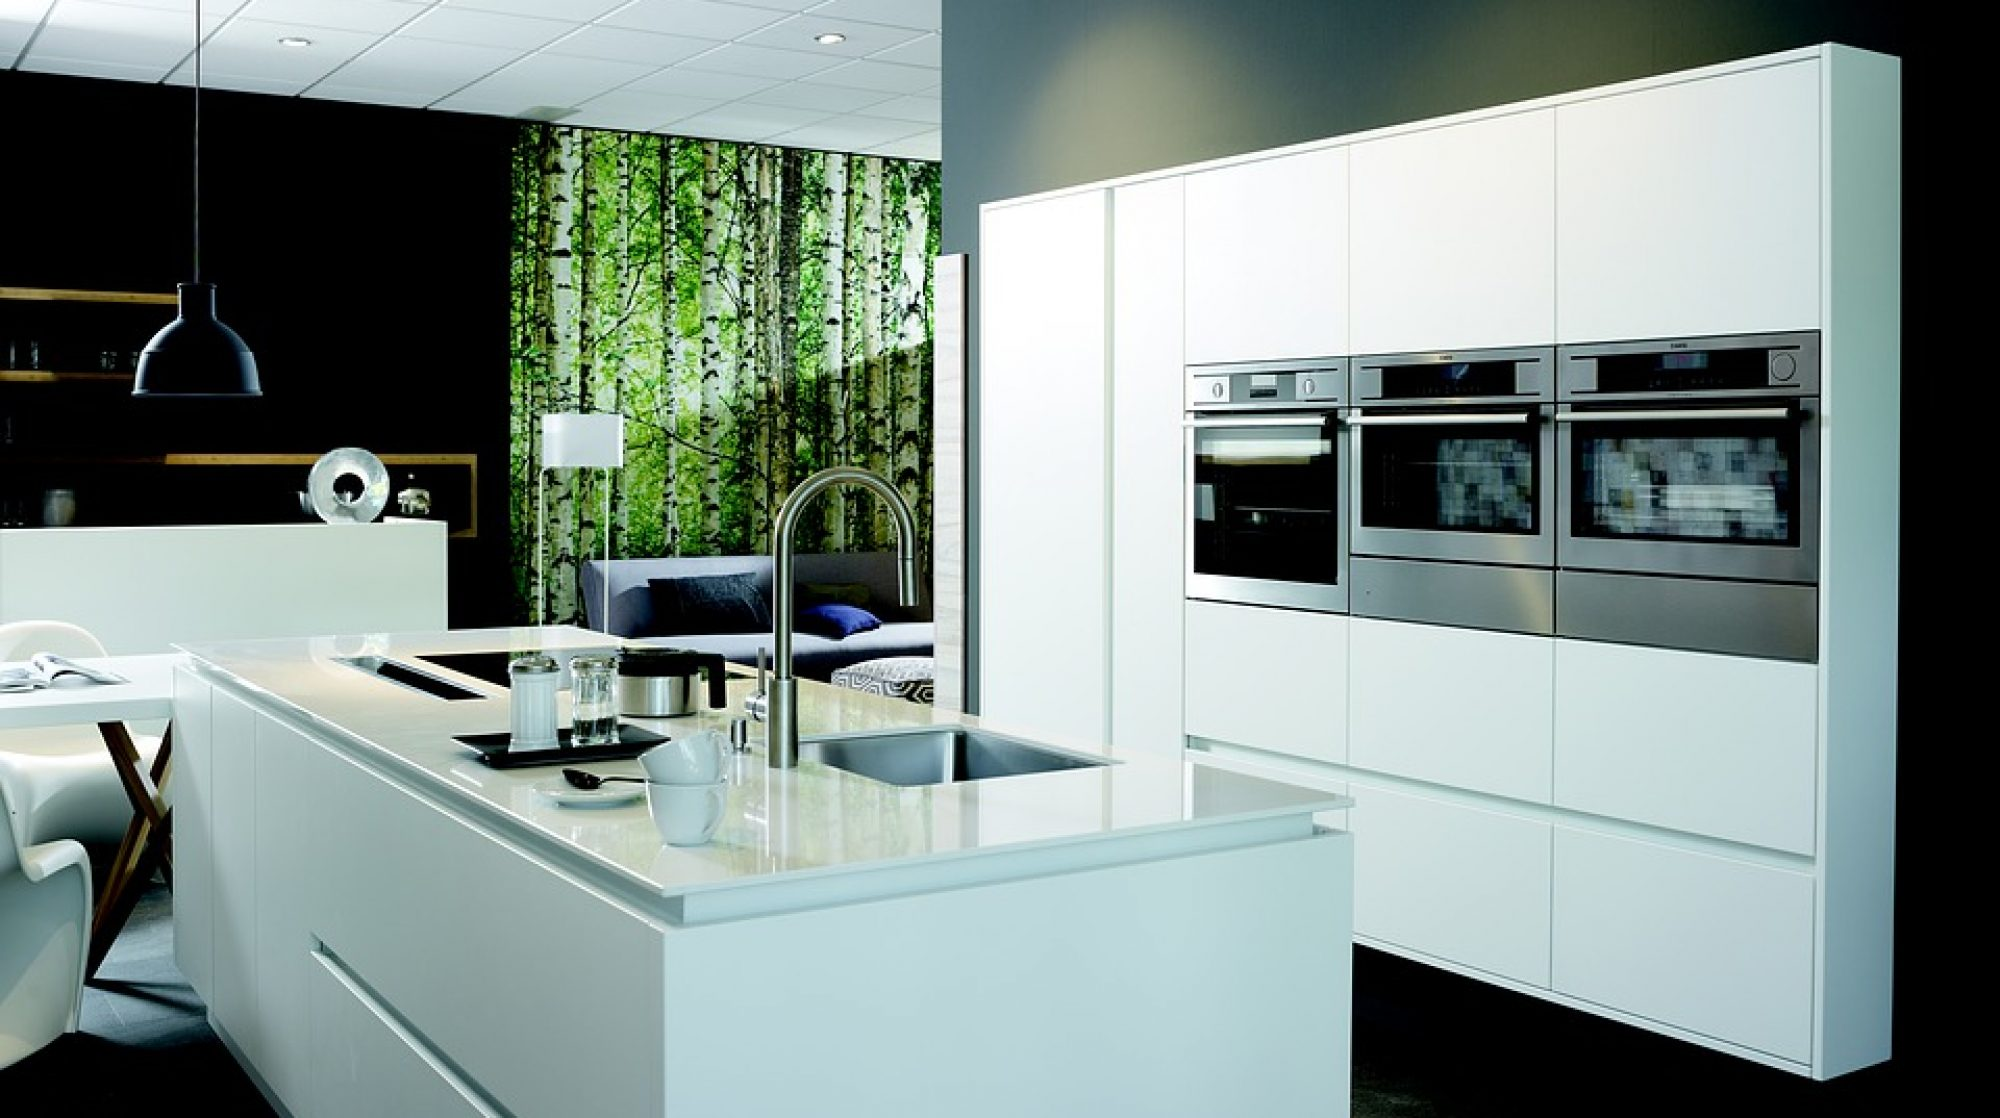 Luxe keuken merken luxe kerken luxekeukenkopen overzicht